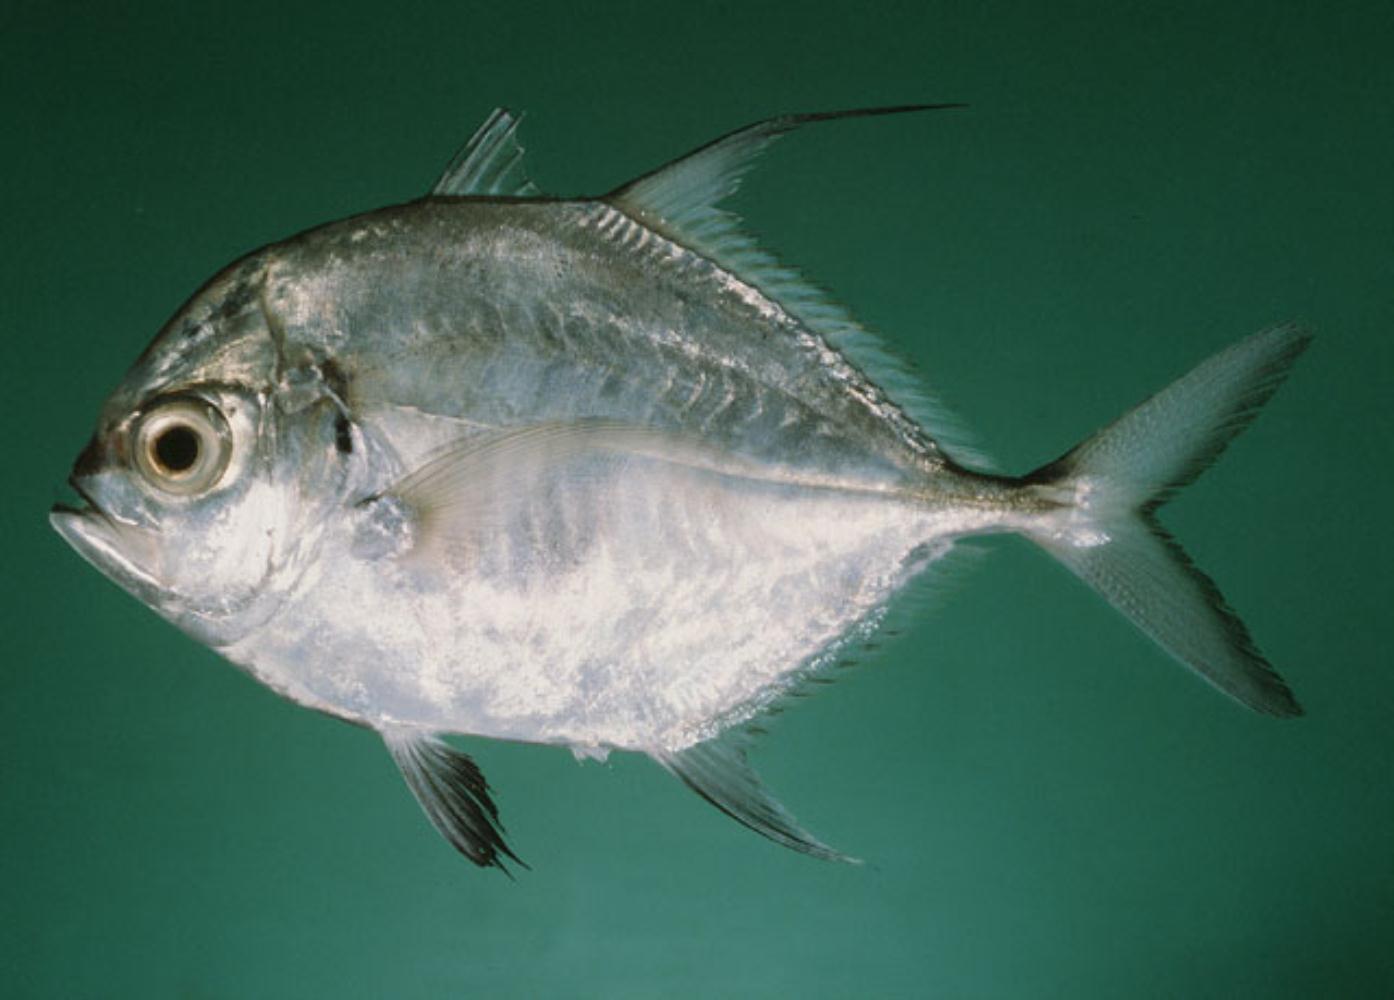 Longfin trevally